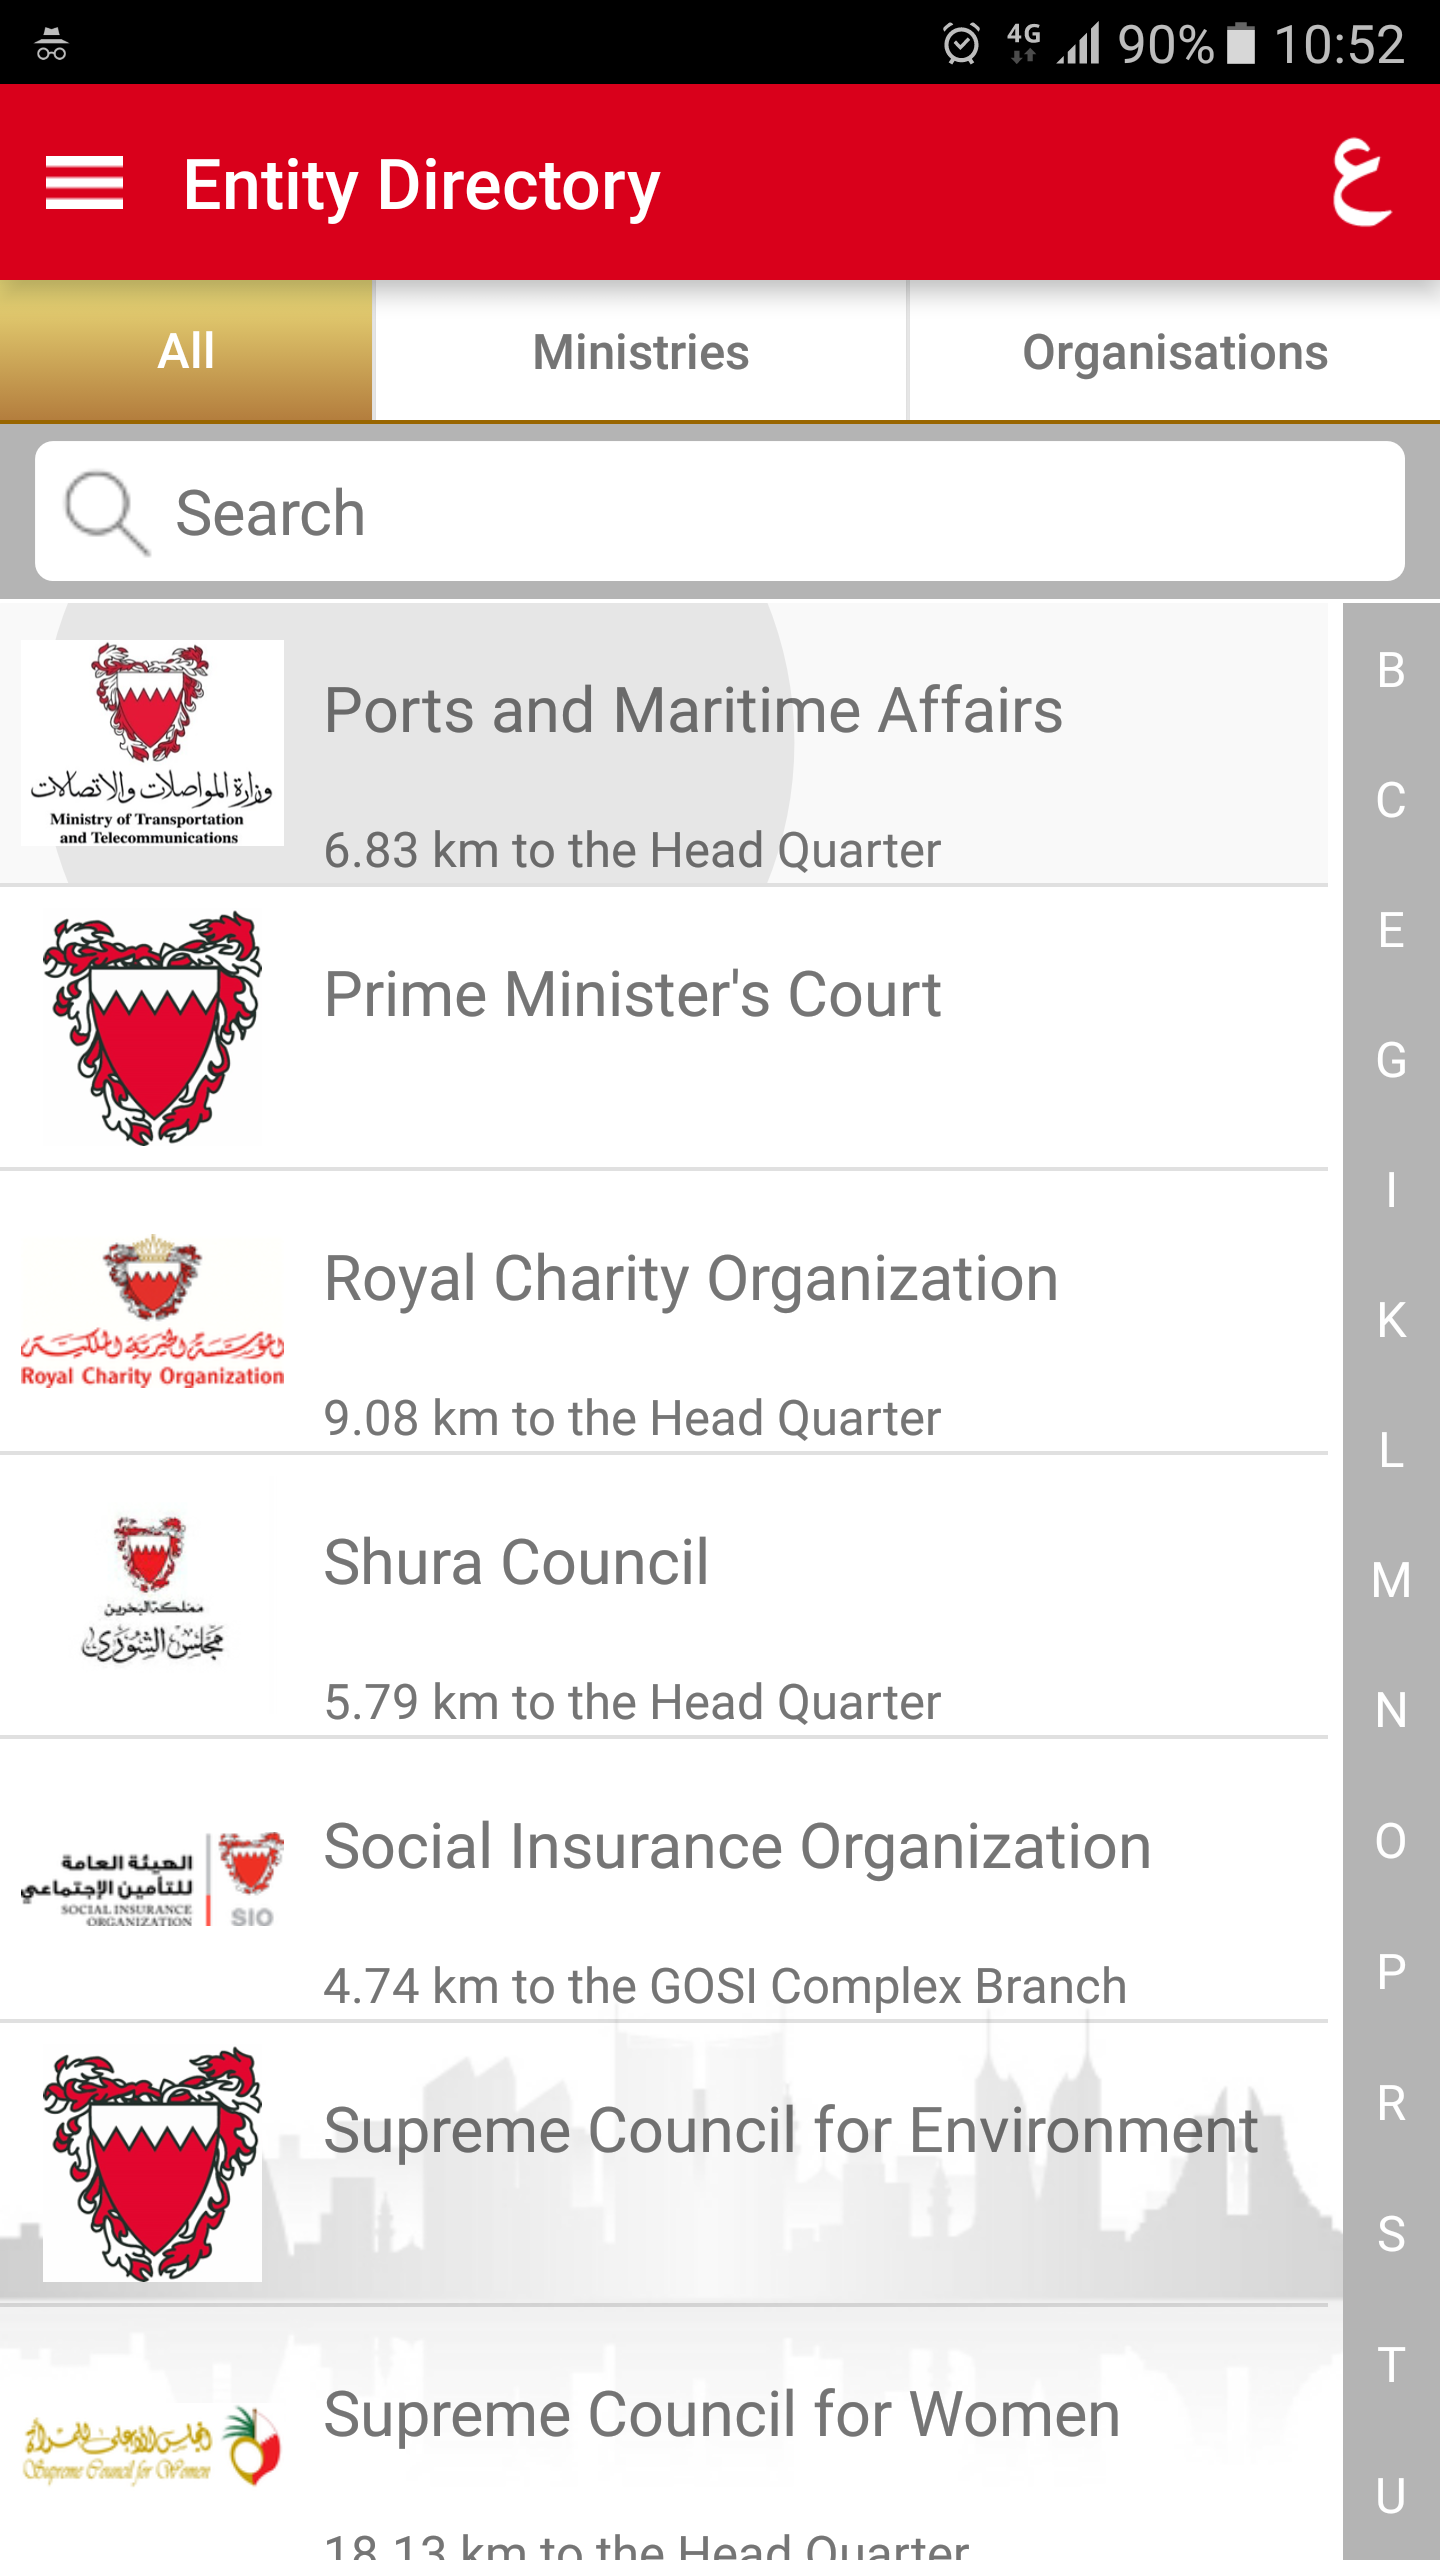 Government Directory Screenshot